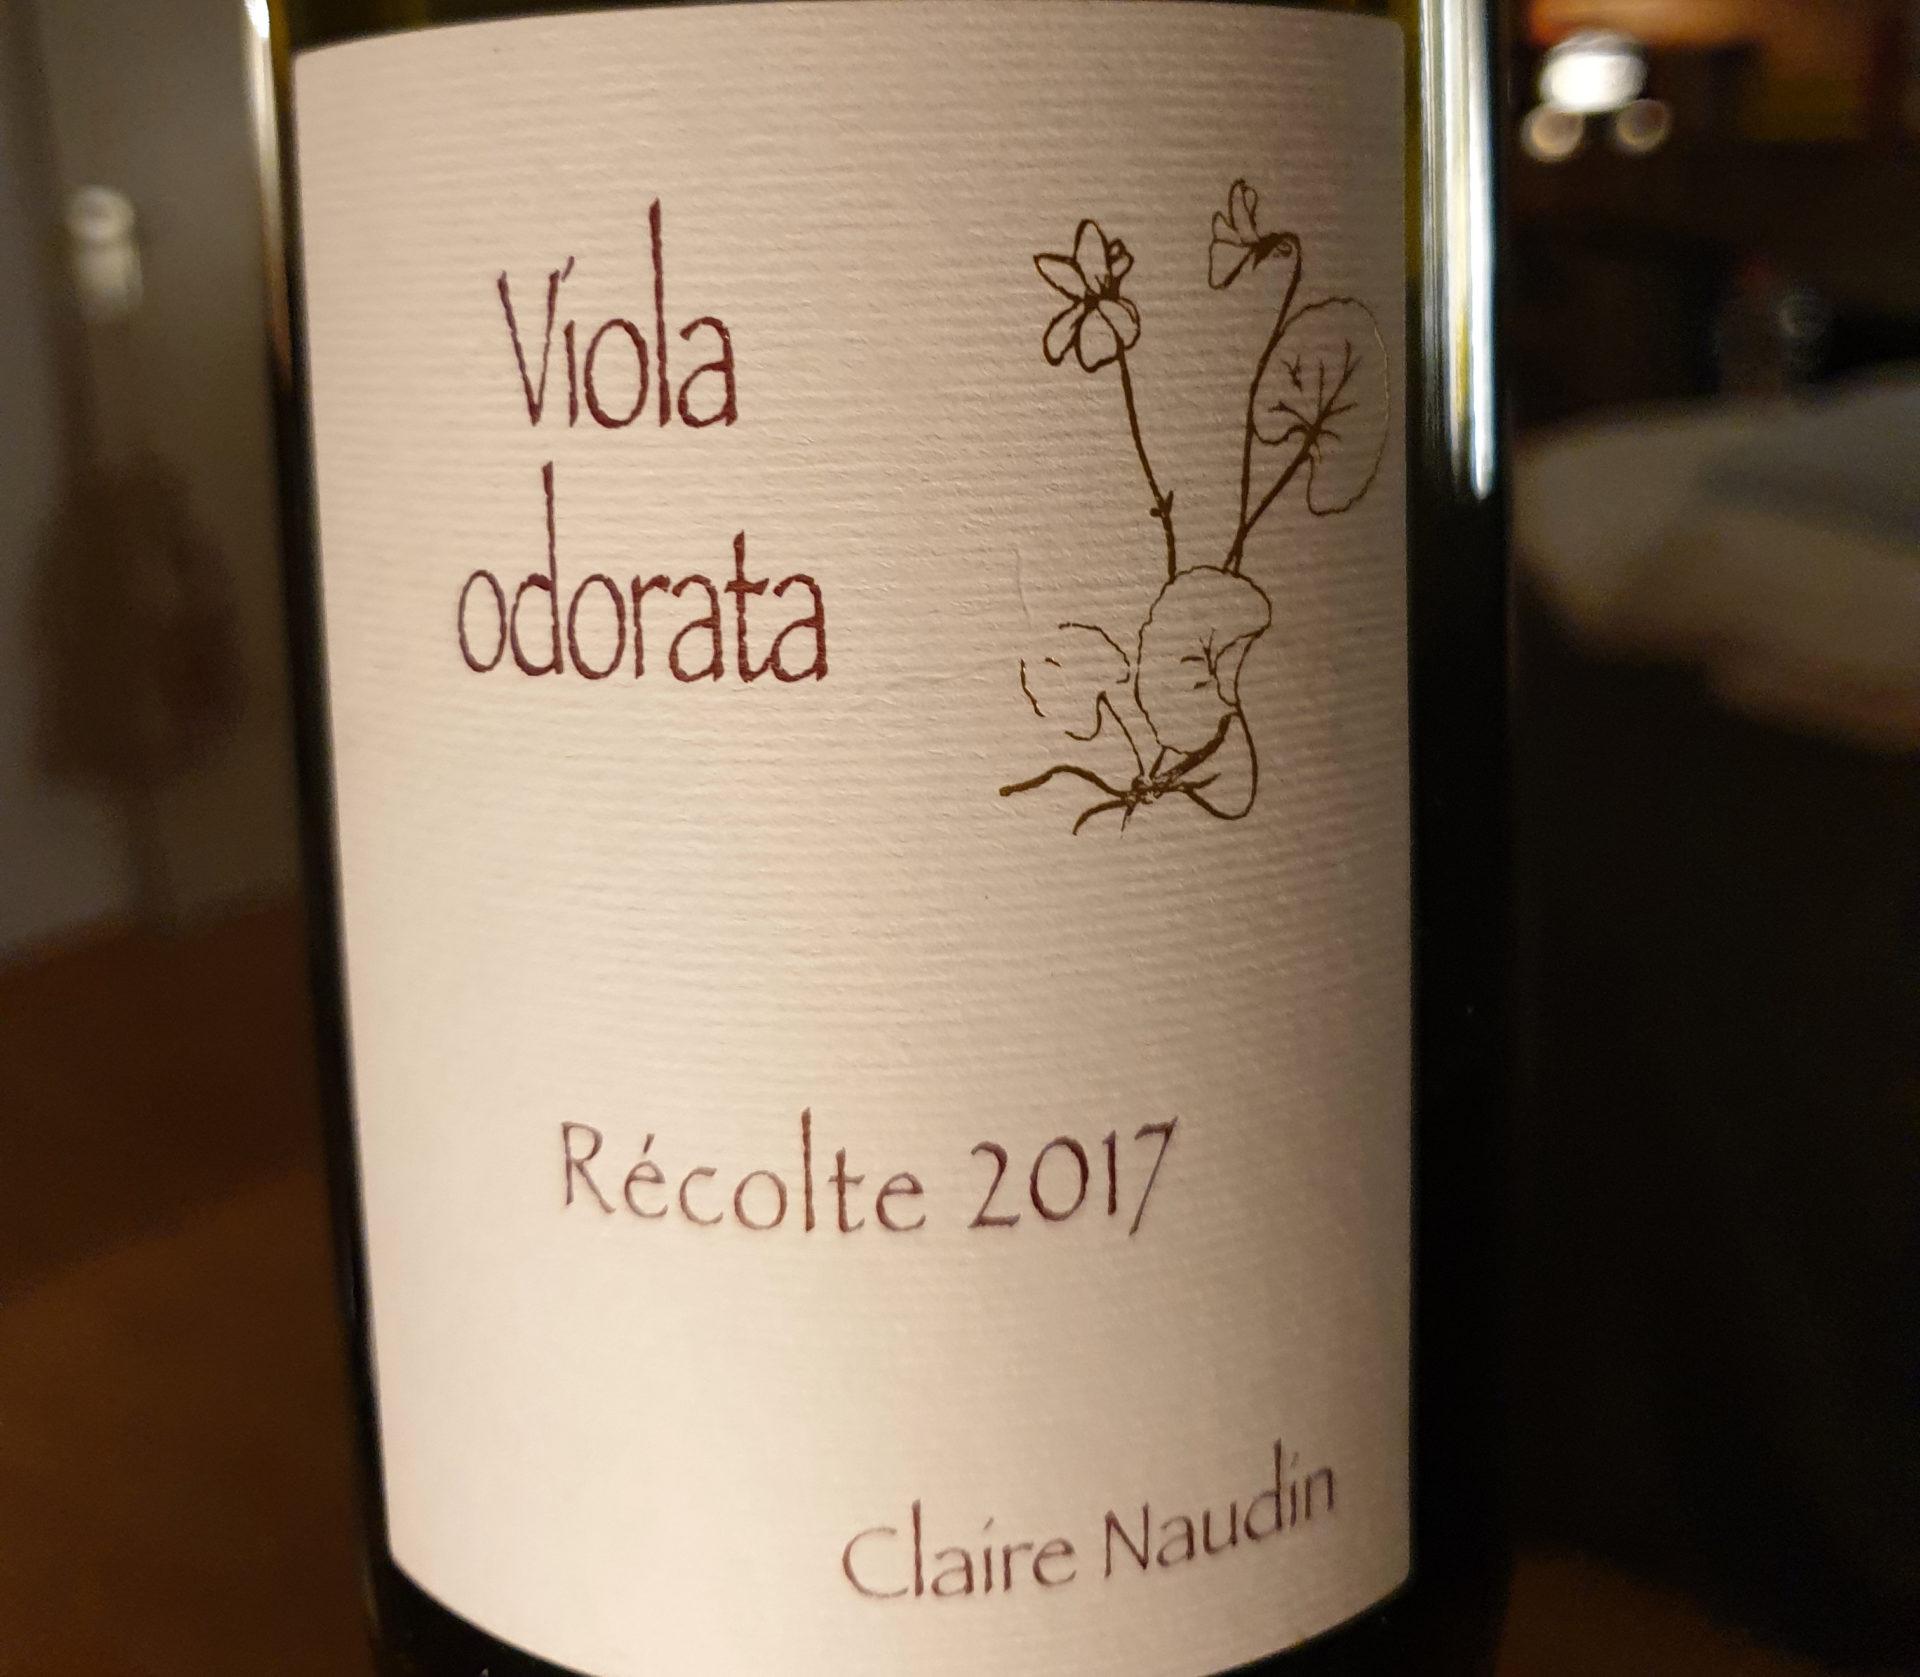 Claire Naudin – Viola Odorata 2017